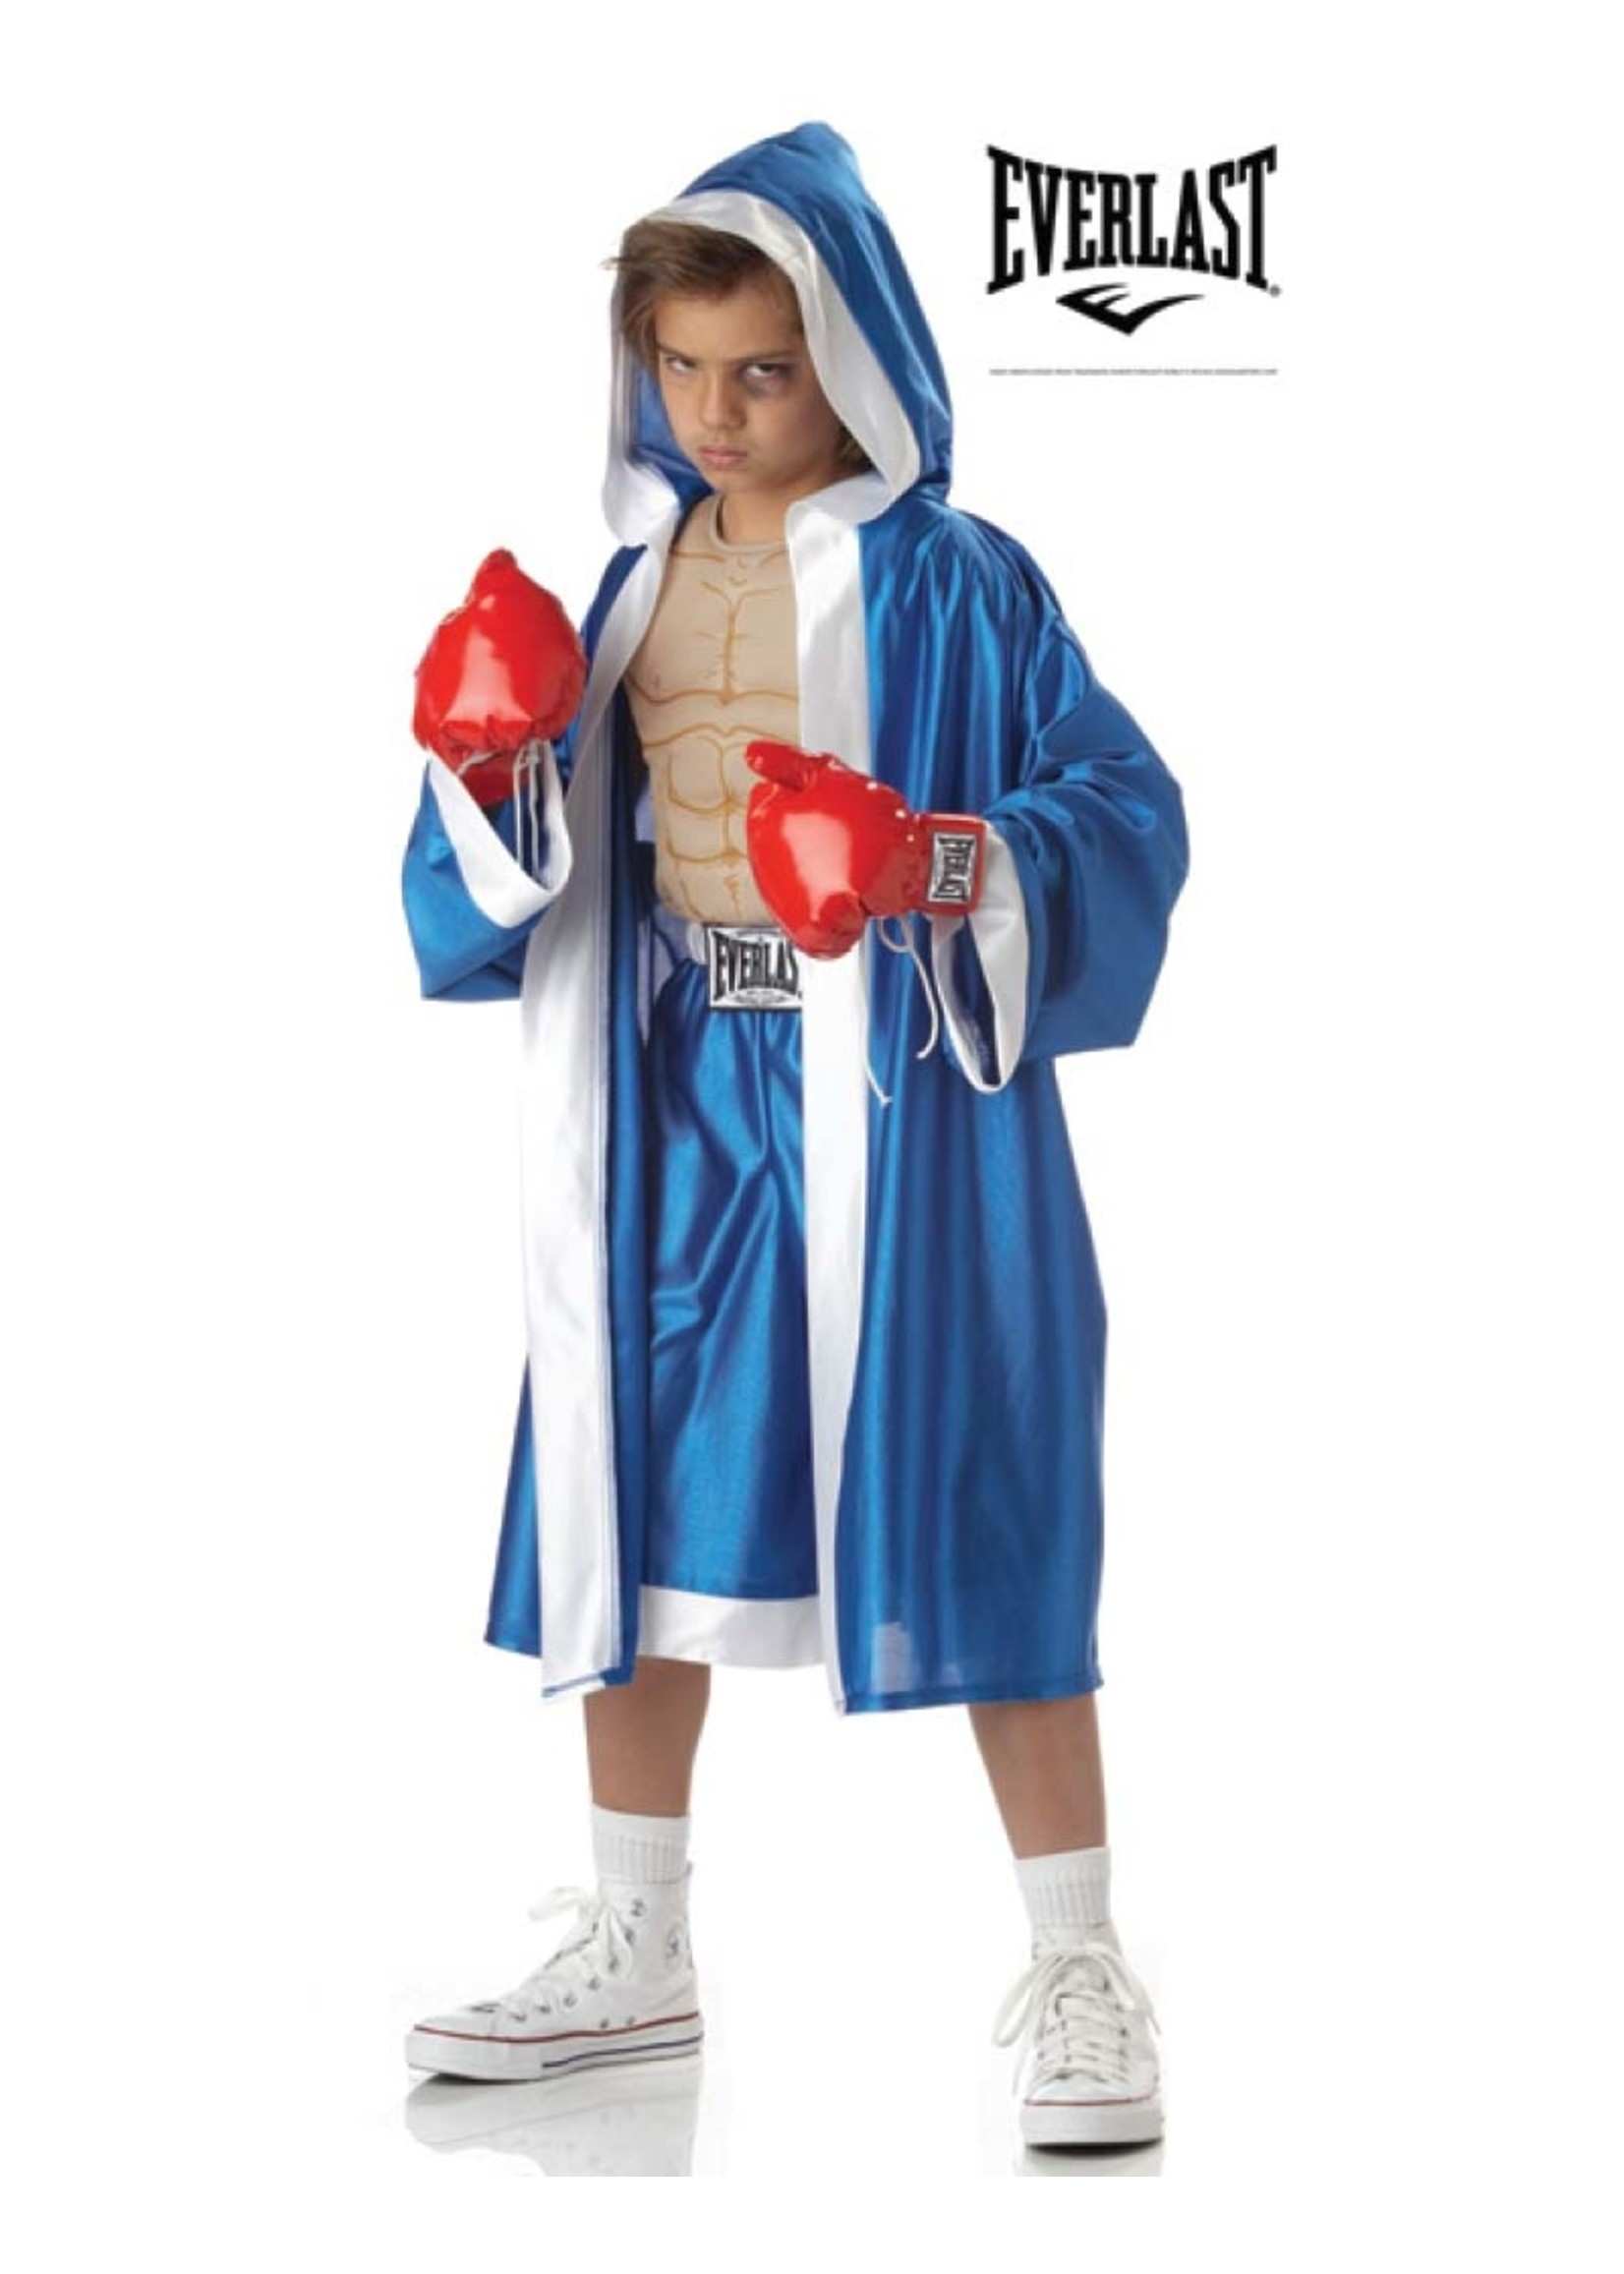 Everlast Boxer - Boy's